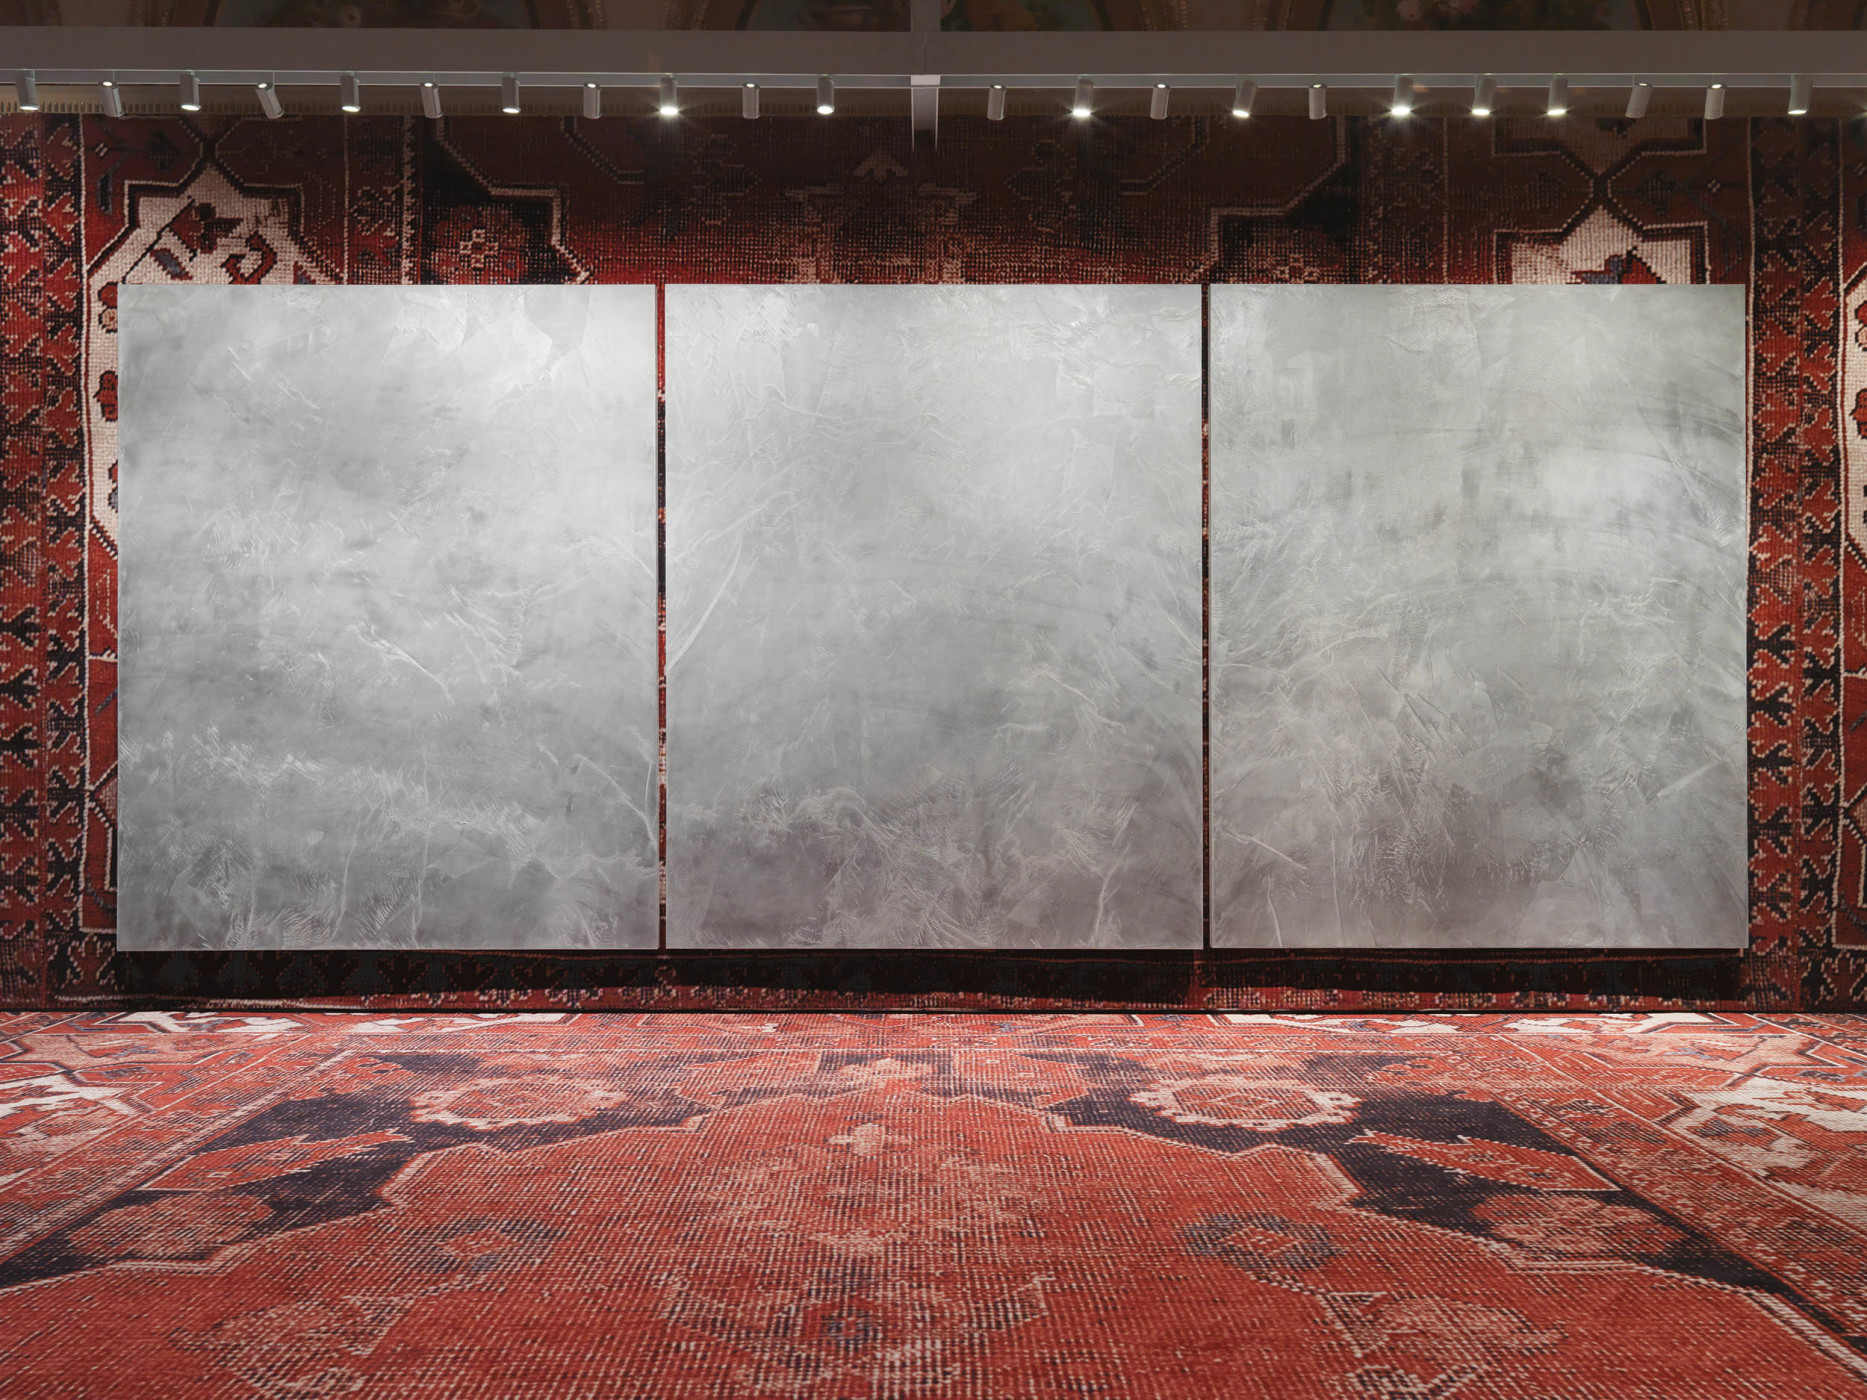 <p>Installation view, Rudolf Stingel, Palazzo Grassi, Venice, Italy, 7 April – 31 December 2013</p>